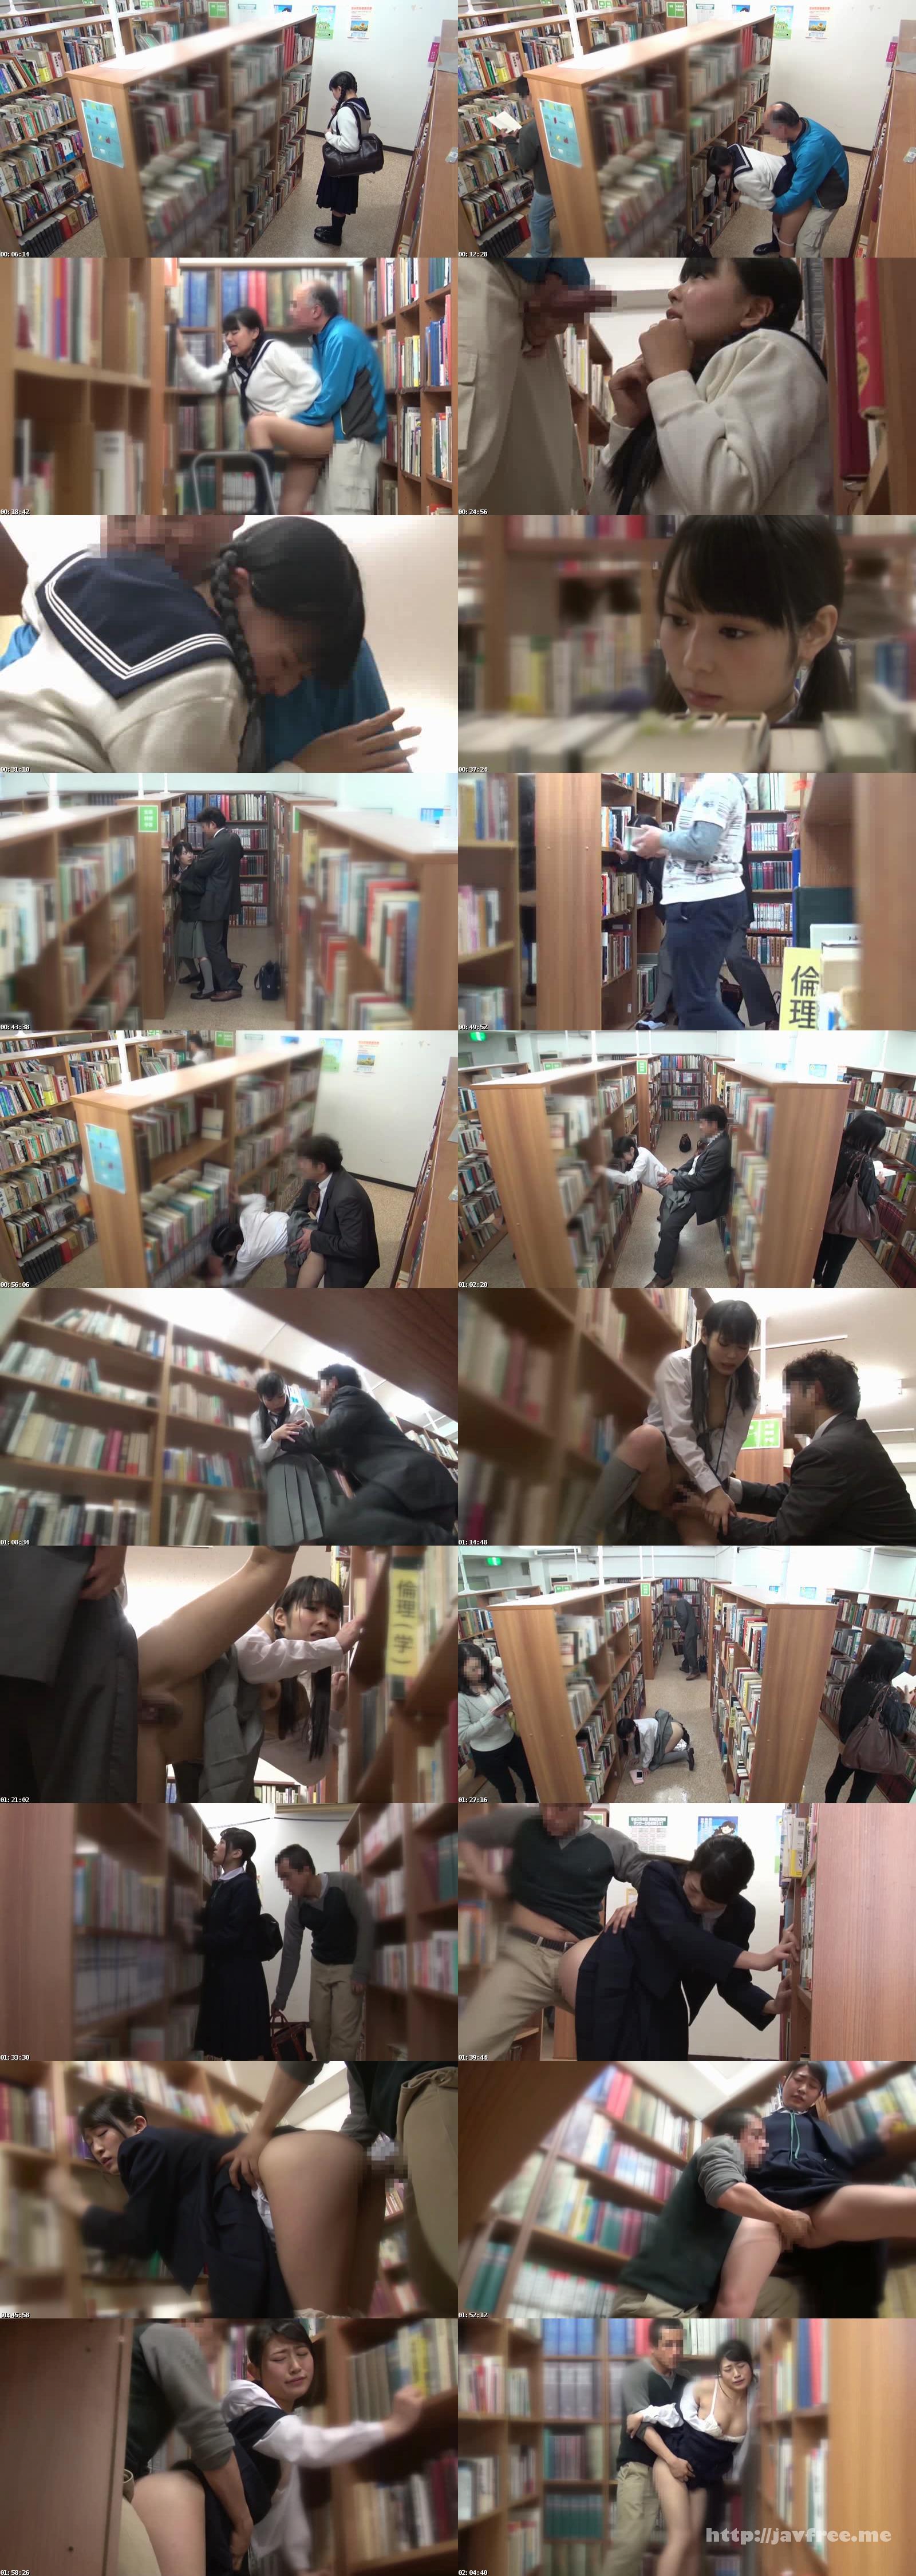 [DVDES-823] 公共施設で突然の強制わいせつ 声を出せない挿れっぱなし図書館 真面目な女子校生の未成熟なキツマンにデカチン即ハメ!合体したまま館内連れ回し!長時間挿入でガマンできずに無念の発情潮!! - image DVDES-823 on https://javfree.me